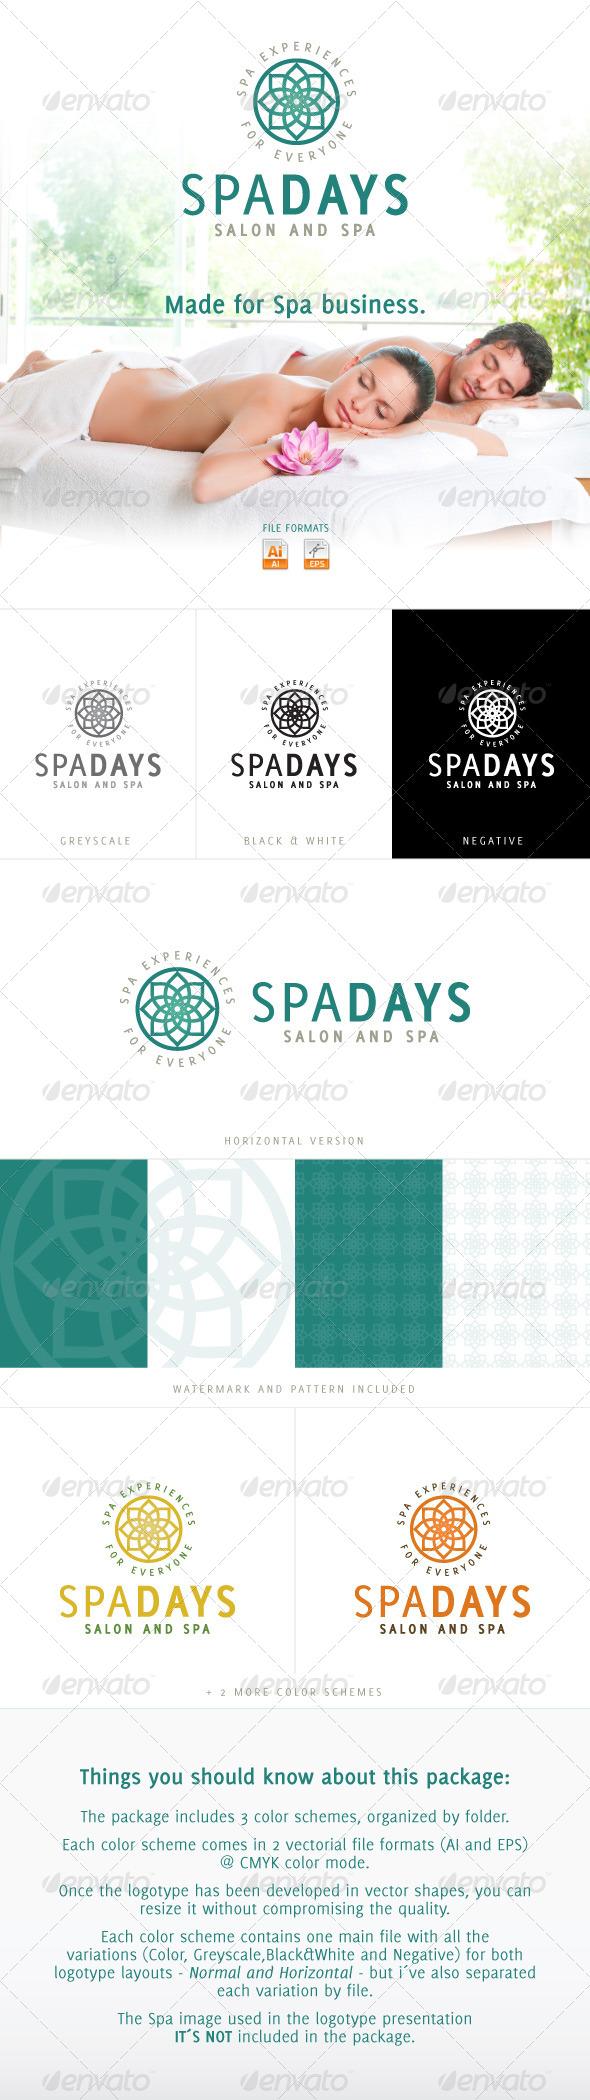 Spa Days - Salon and SPA - Logo Templates